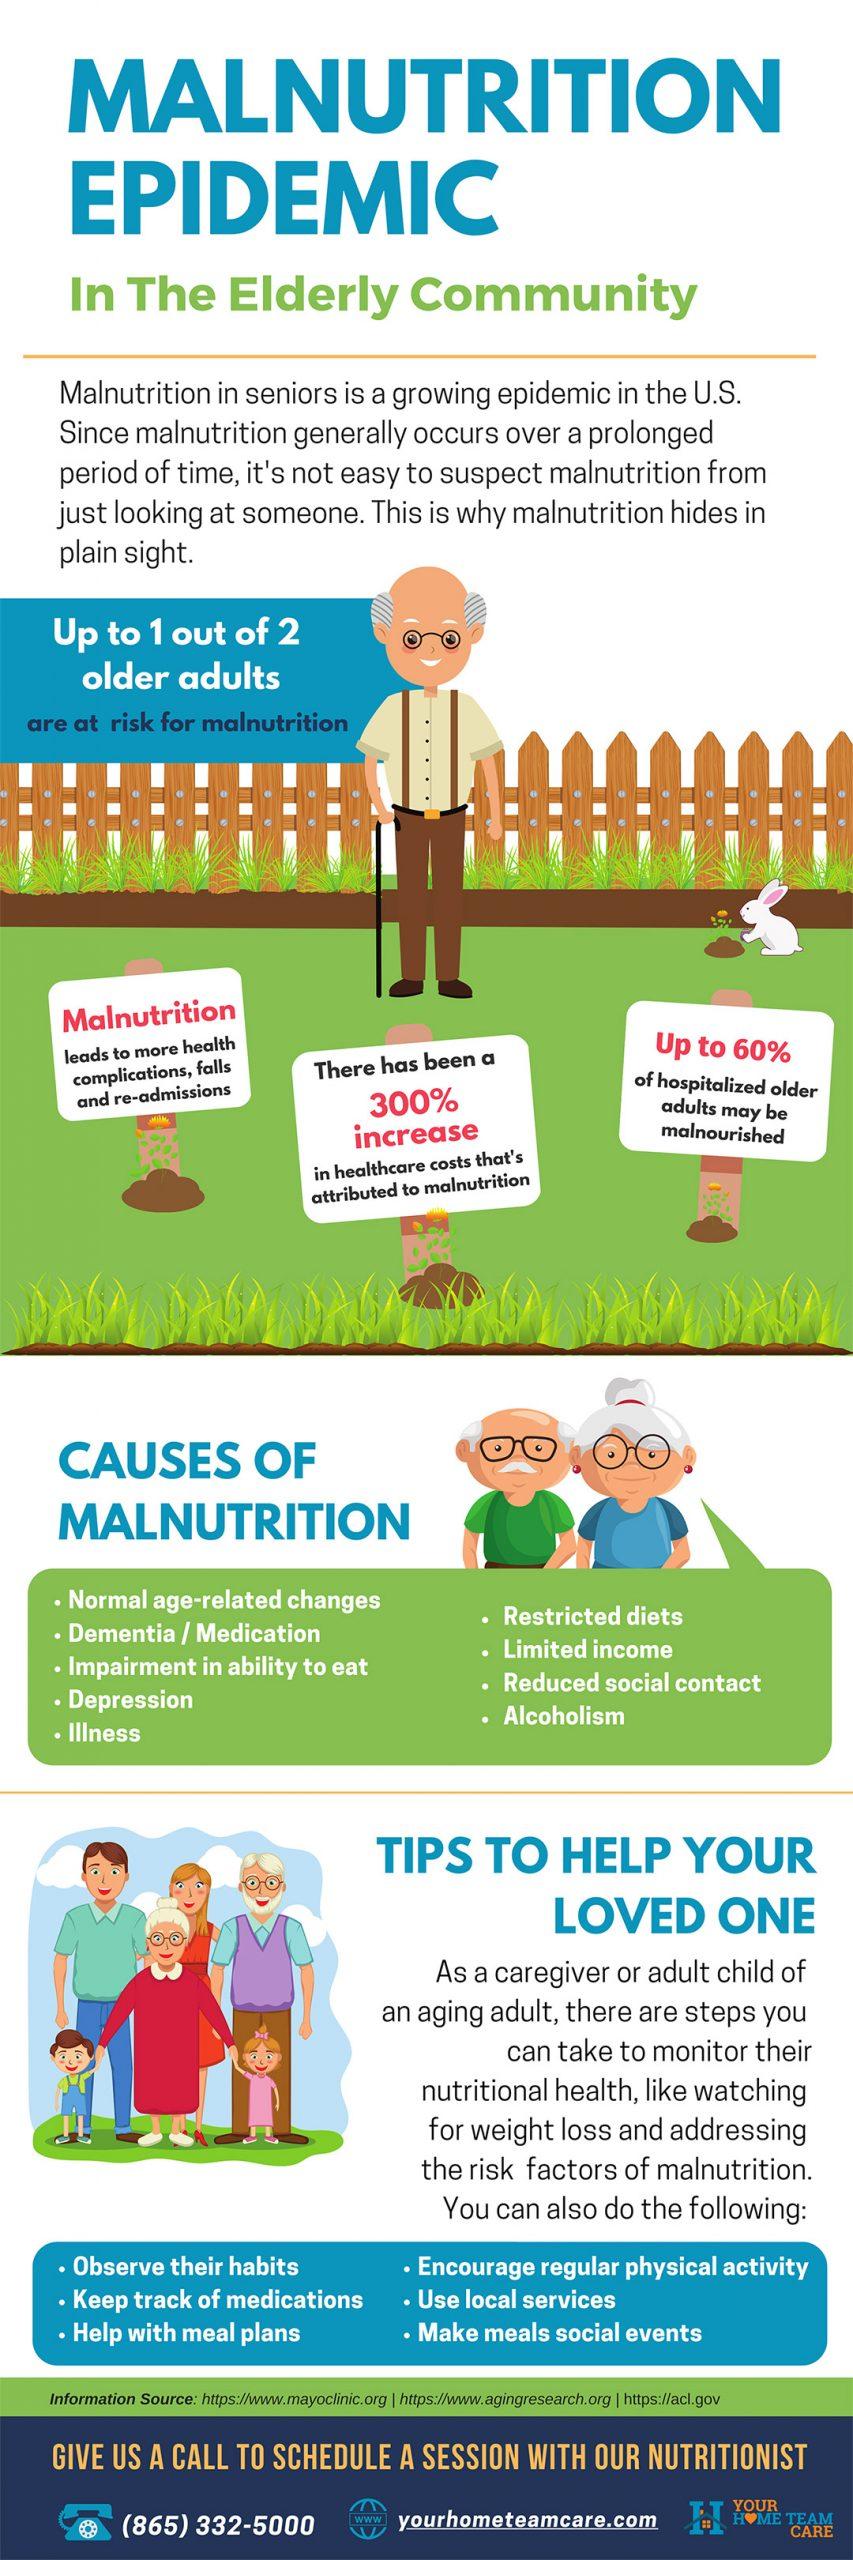 Malnutrition-Epidemic-in-the-Elderly-1080x